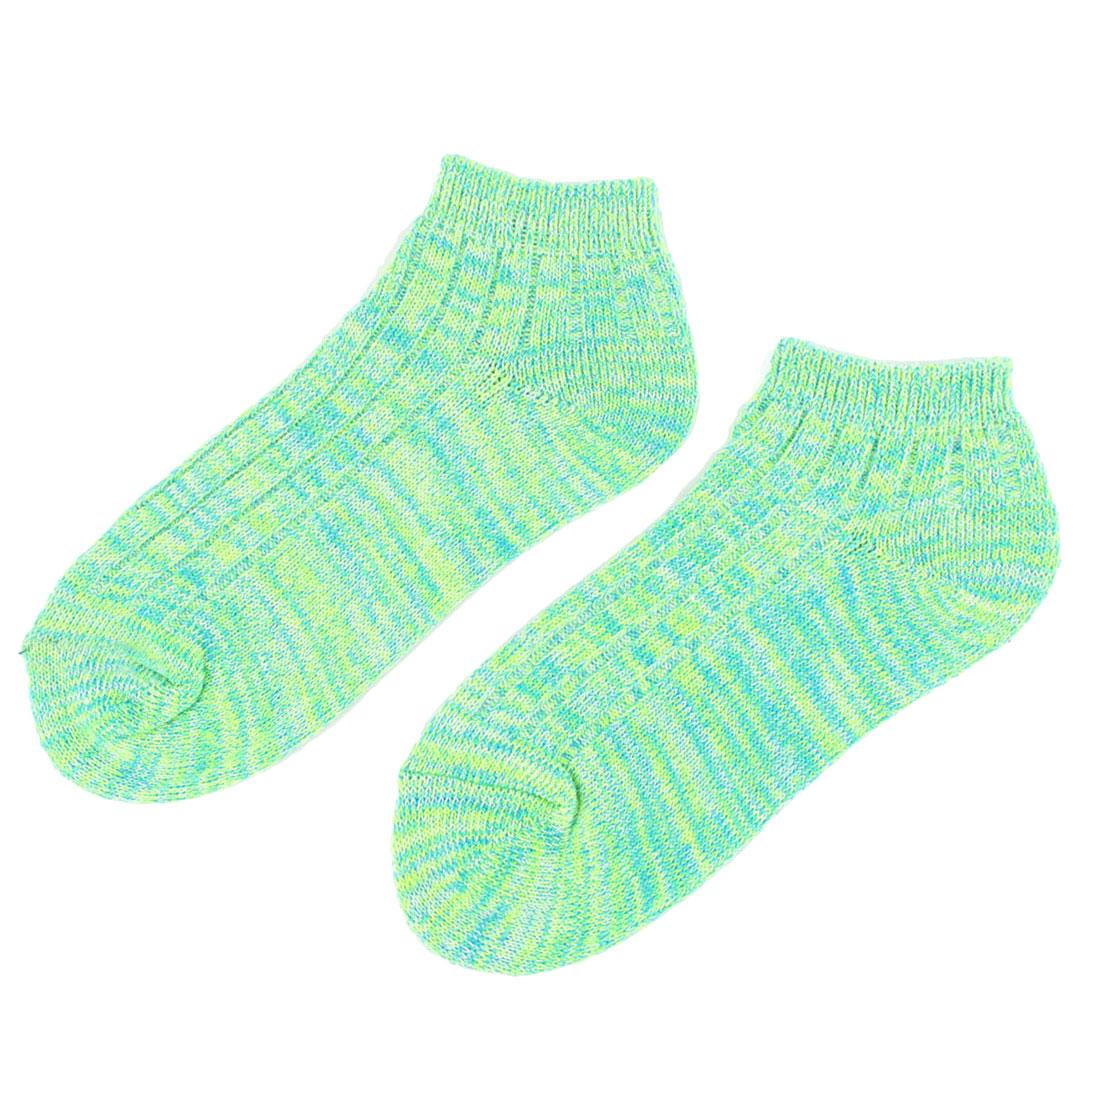 Men Elastic Low Cut Cuffs Ankle Length Short Socks Light Green Blue Pair